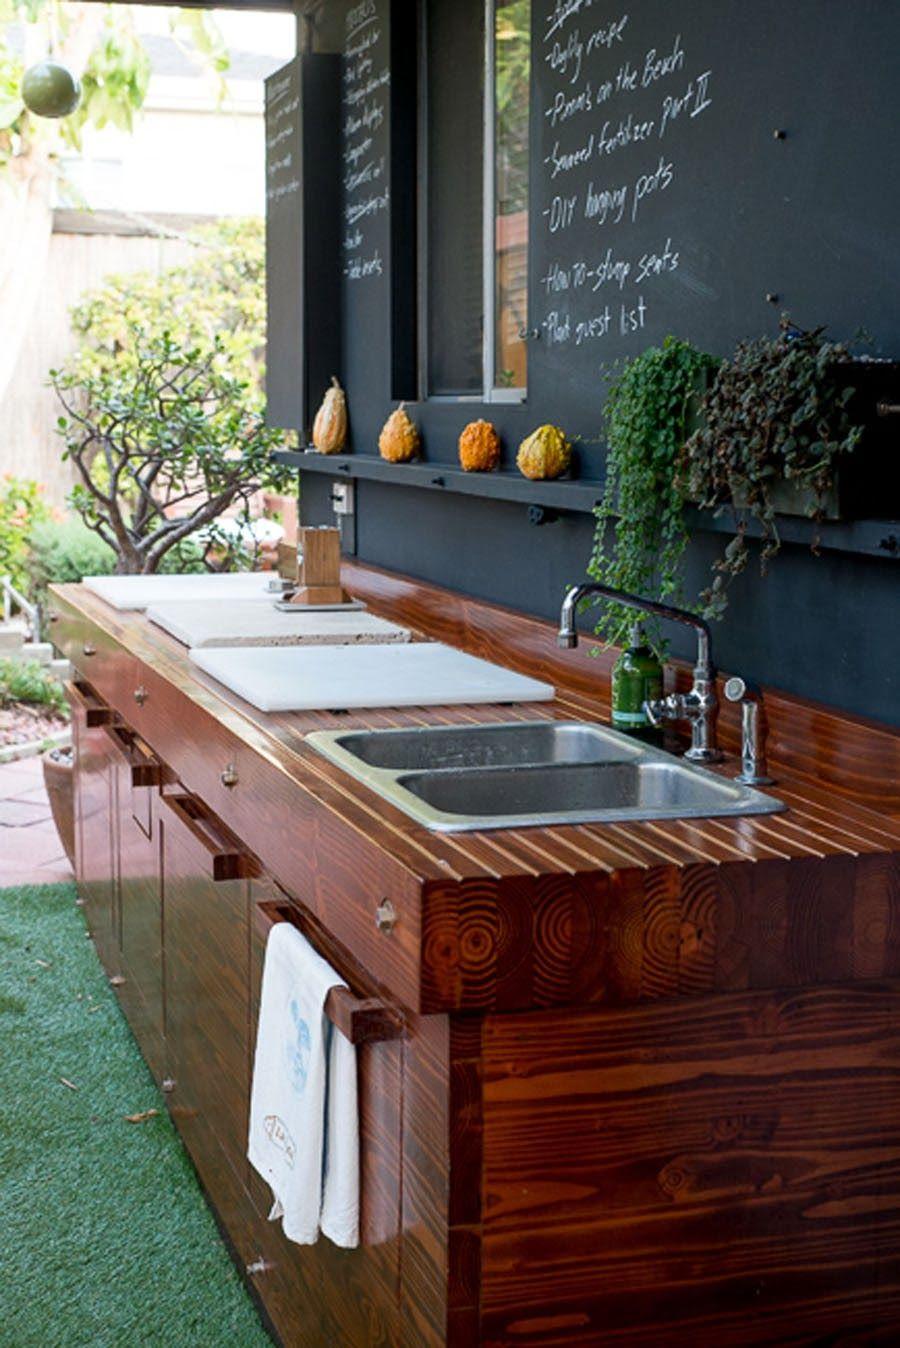 Pin by charlotte løkkemadsen on kitchens pinterest outdoor